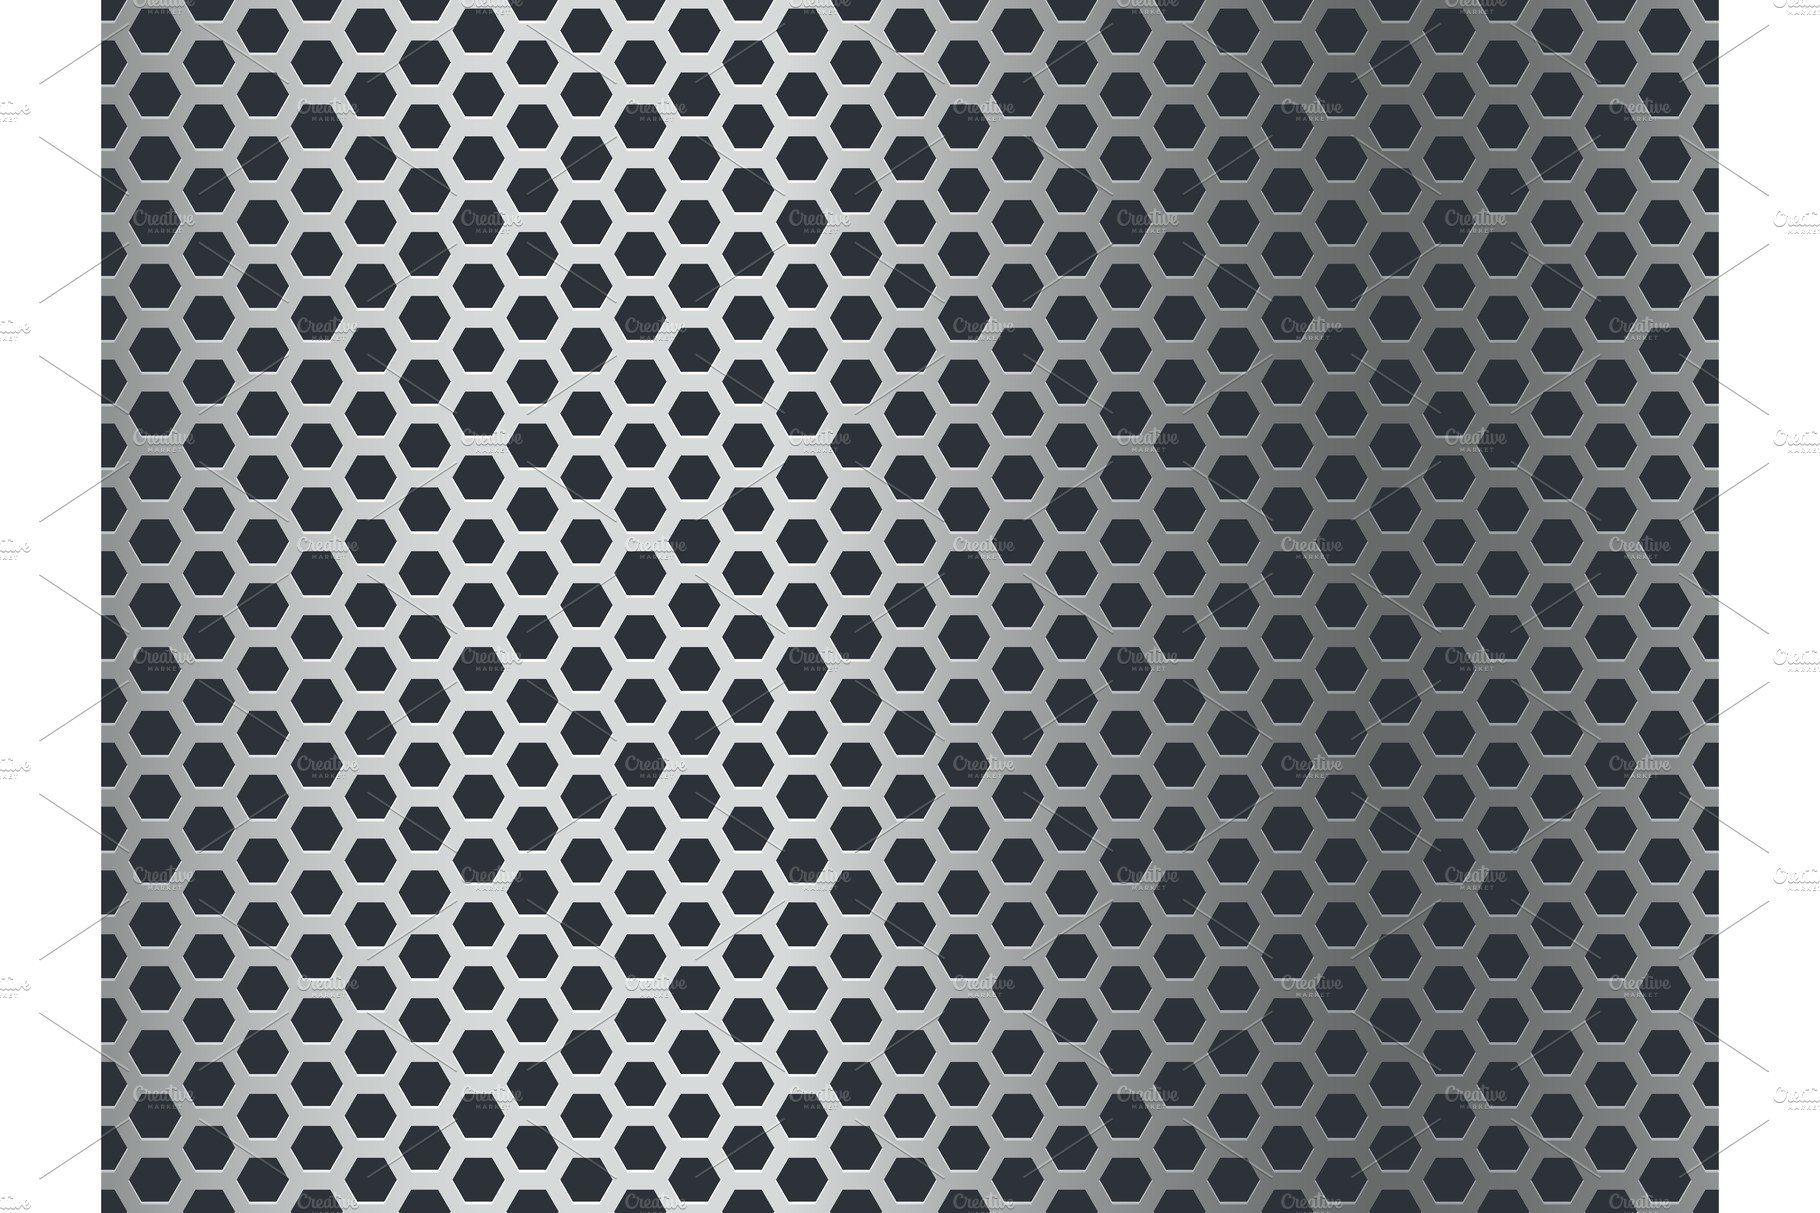 Metal Texture Pattern Seamless Metal Texture Textures Patterns Texture